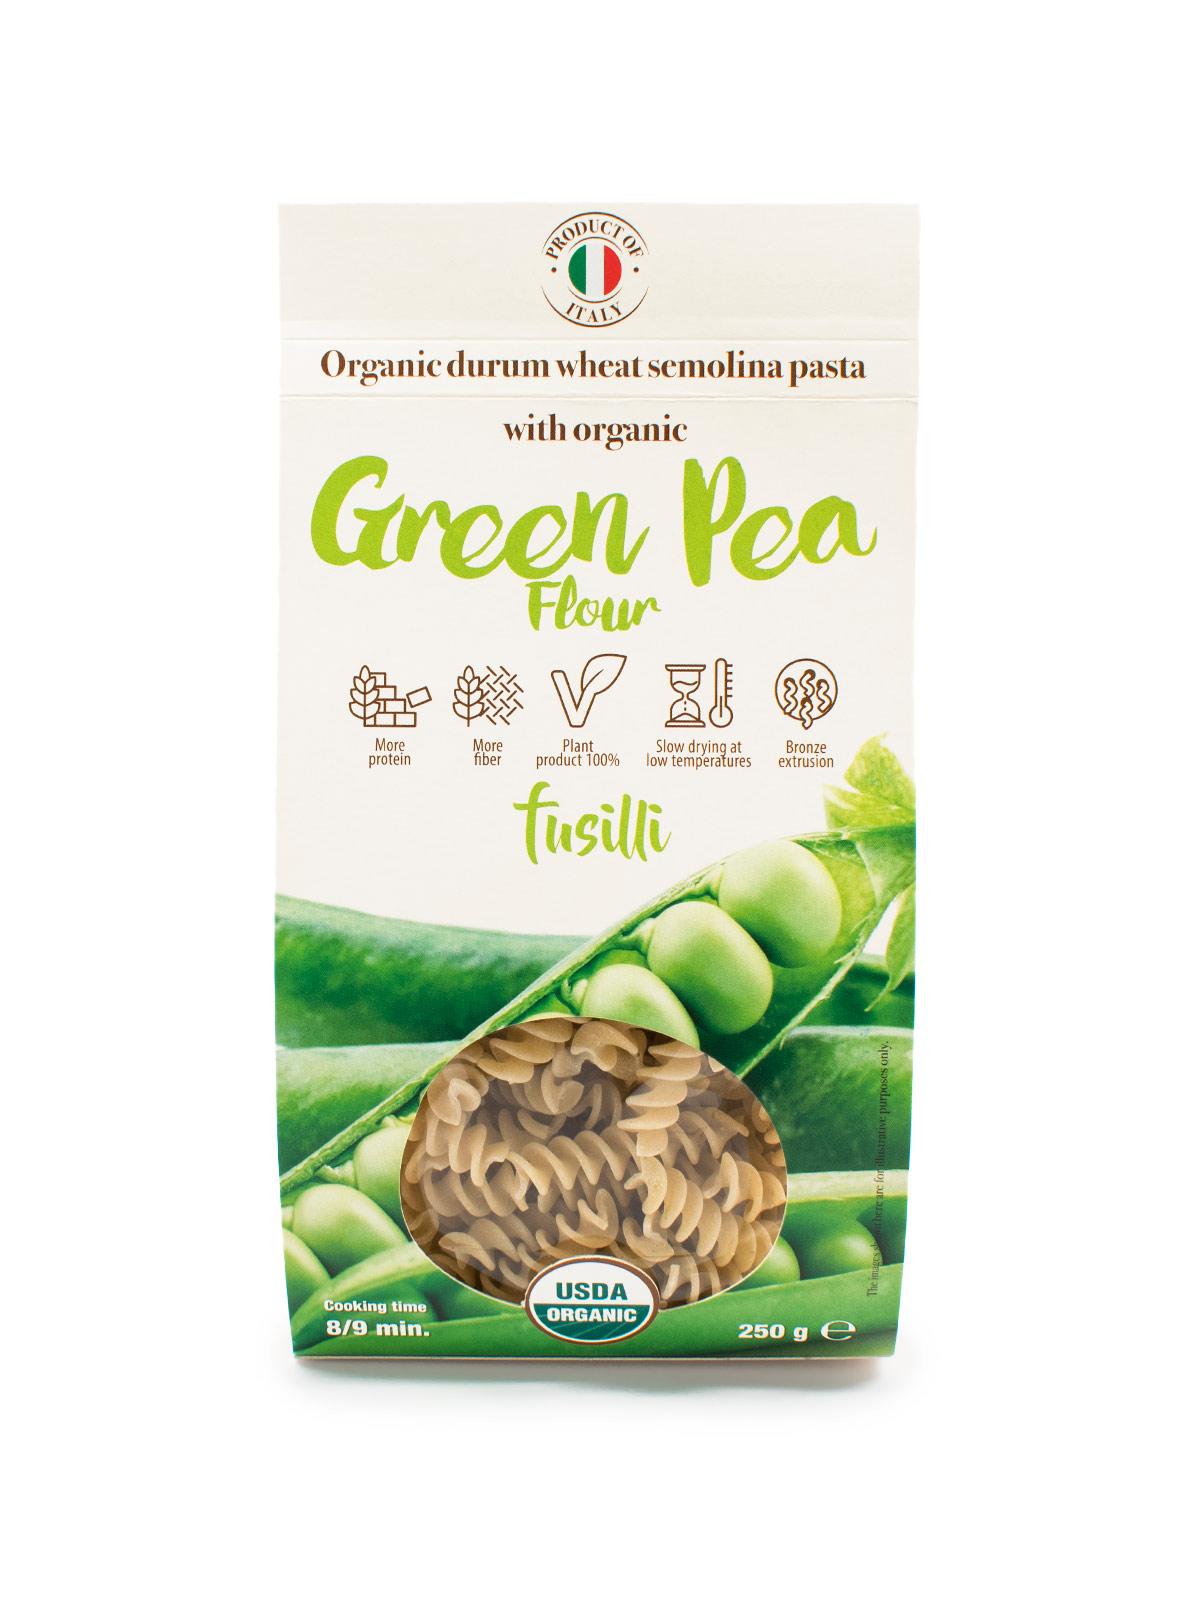 Fusilli with Organic Green Pea Flour - Pastas, Rice, and Grains - Buon'Italia